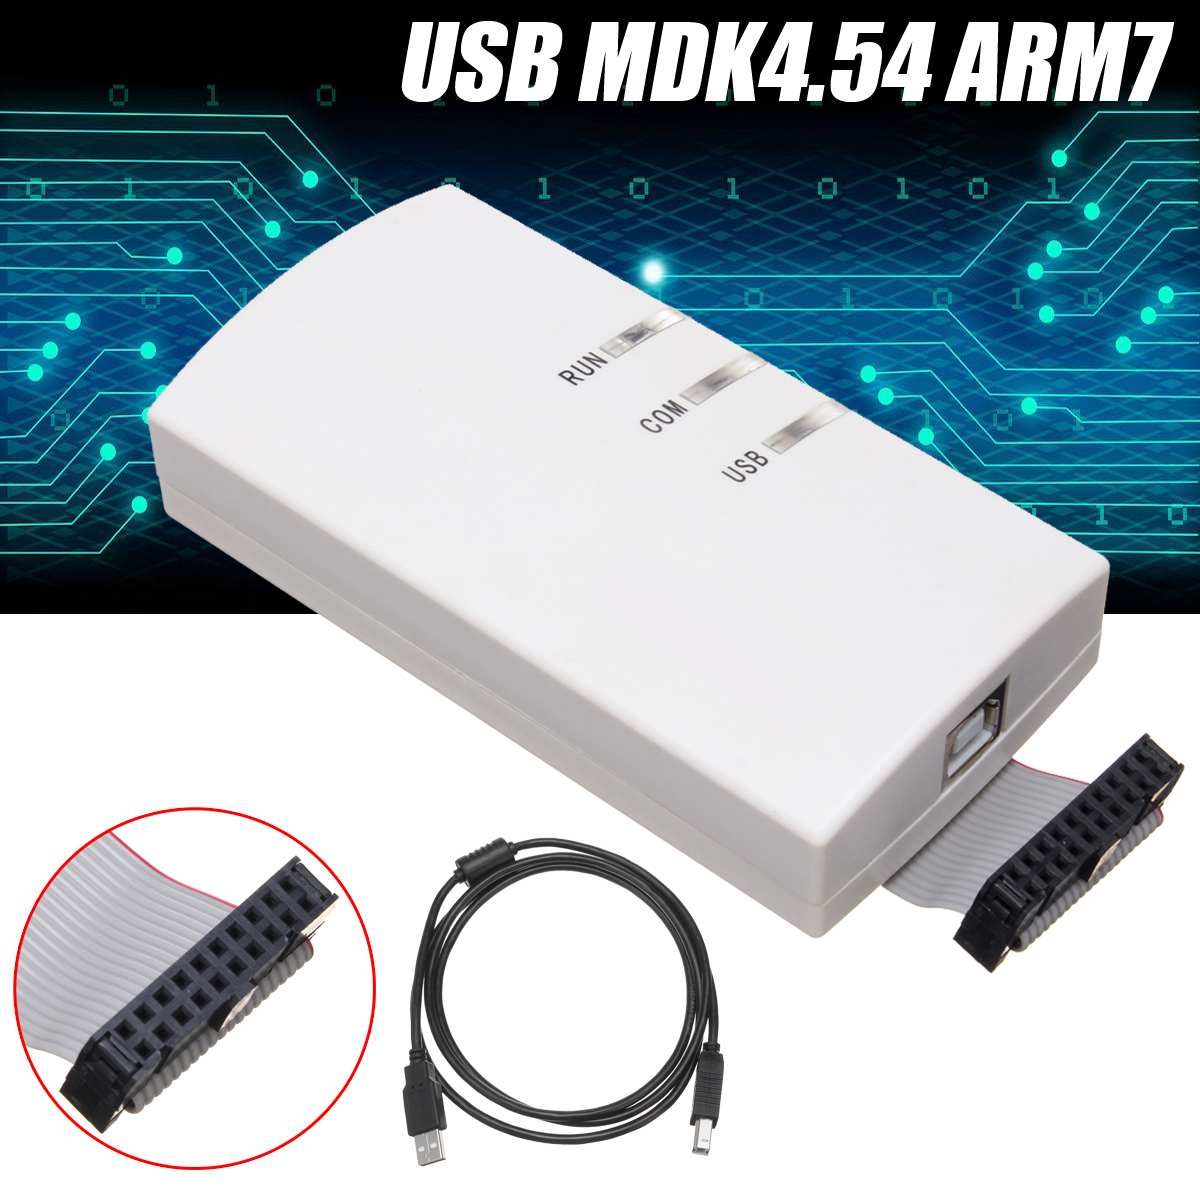 ULINK2 Emulator USB JTAG Emulator Support MDK4.54 ARM7 Cortex Debug Adapter AK+20PIN Flat CableULINK2 Emulator USB JTAG Emulator Support MDK4.54 ARM7 Cortex Debug Adapter AK+20PIN Flat Cable